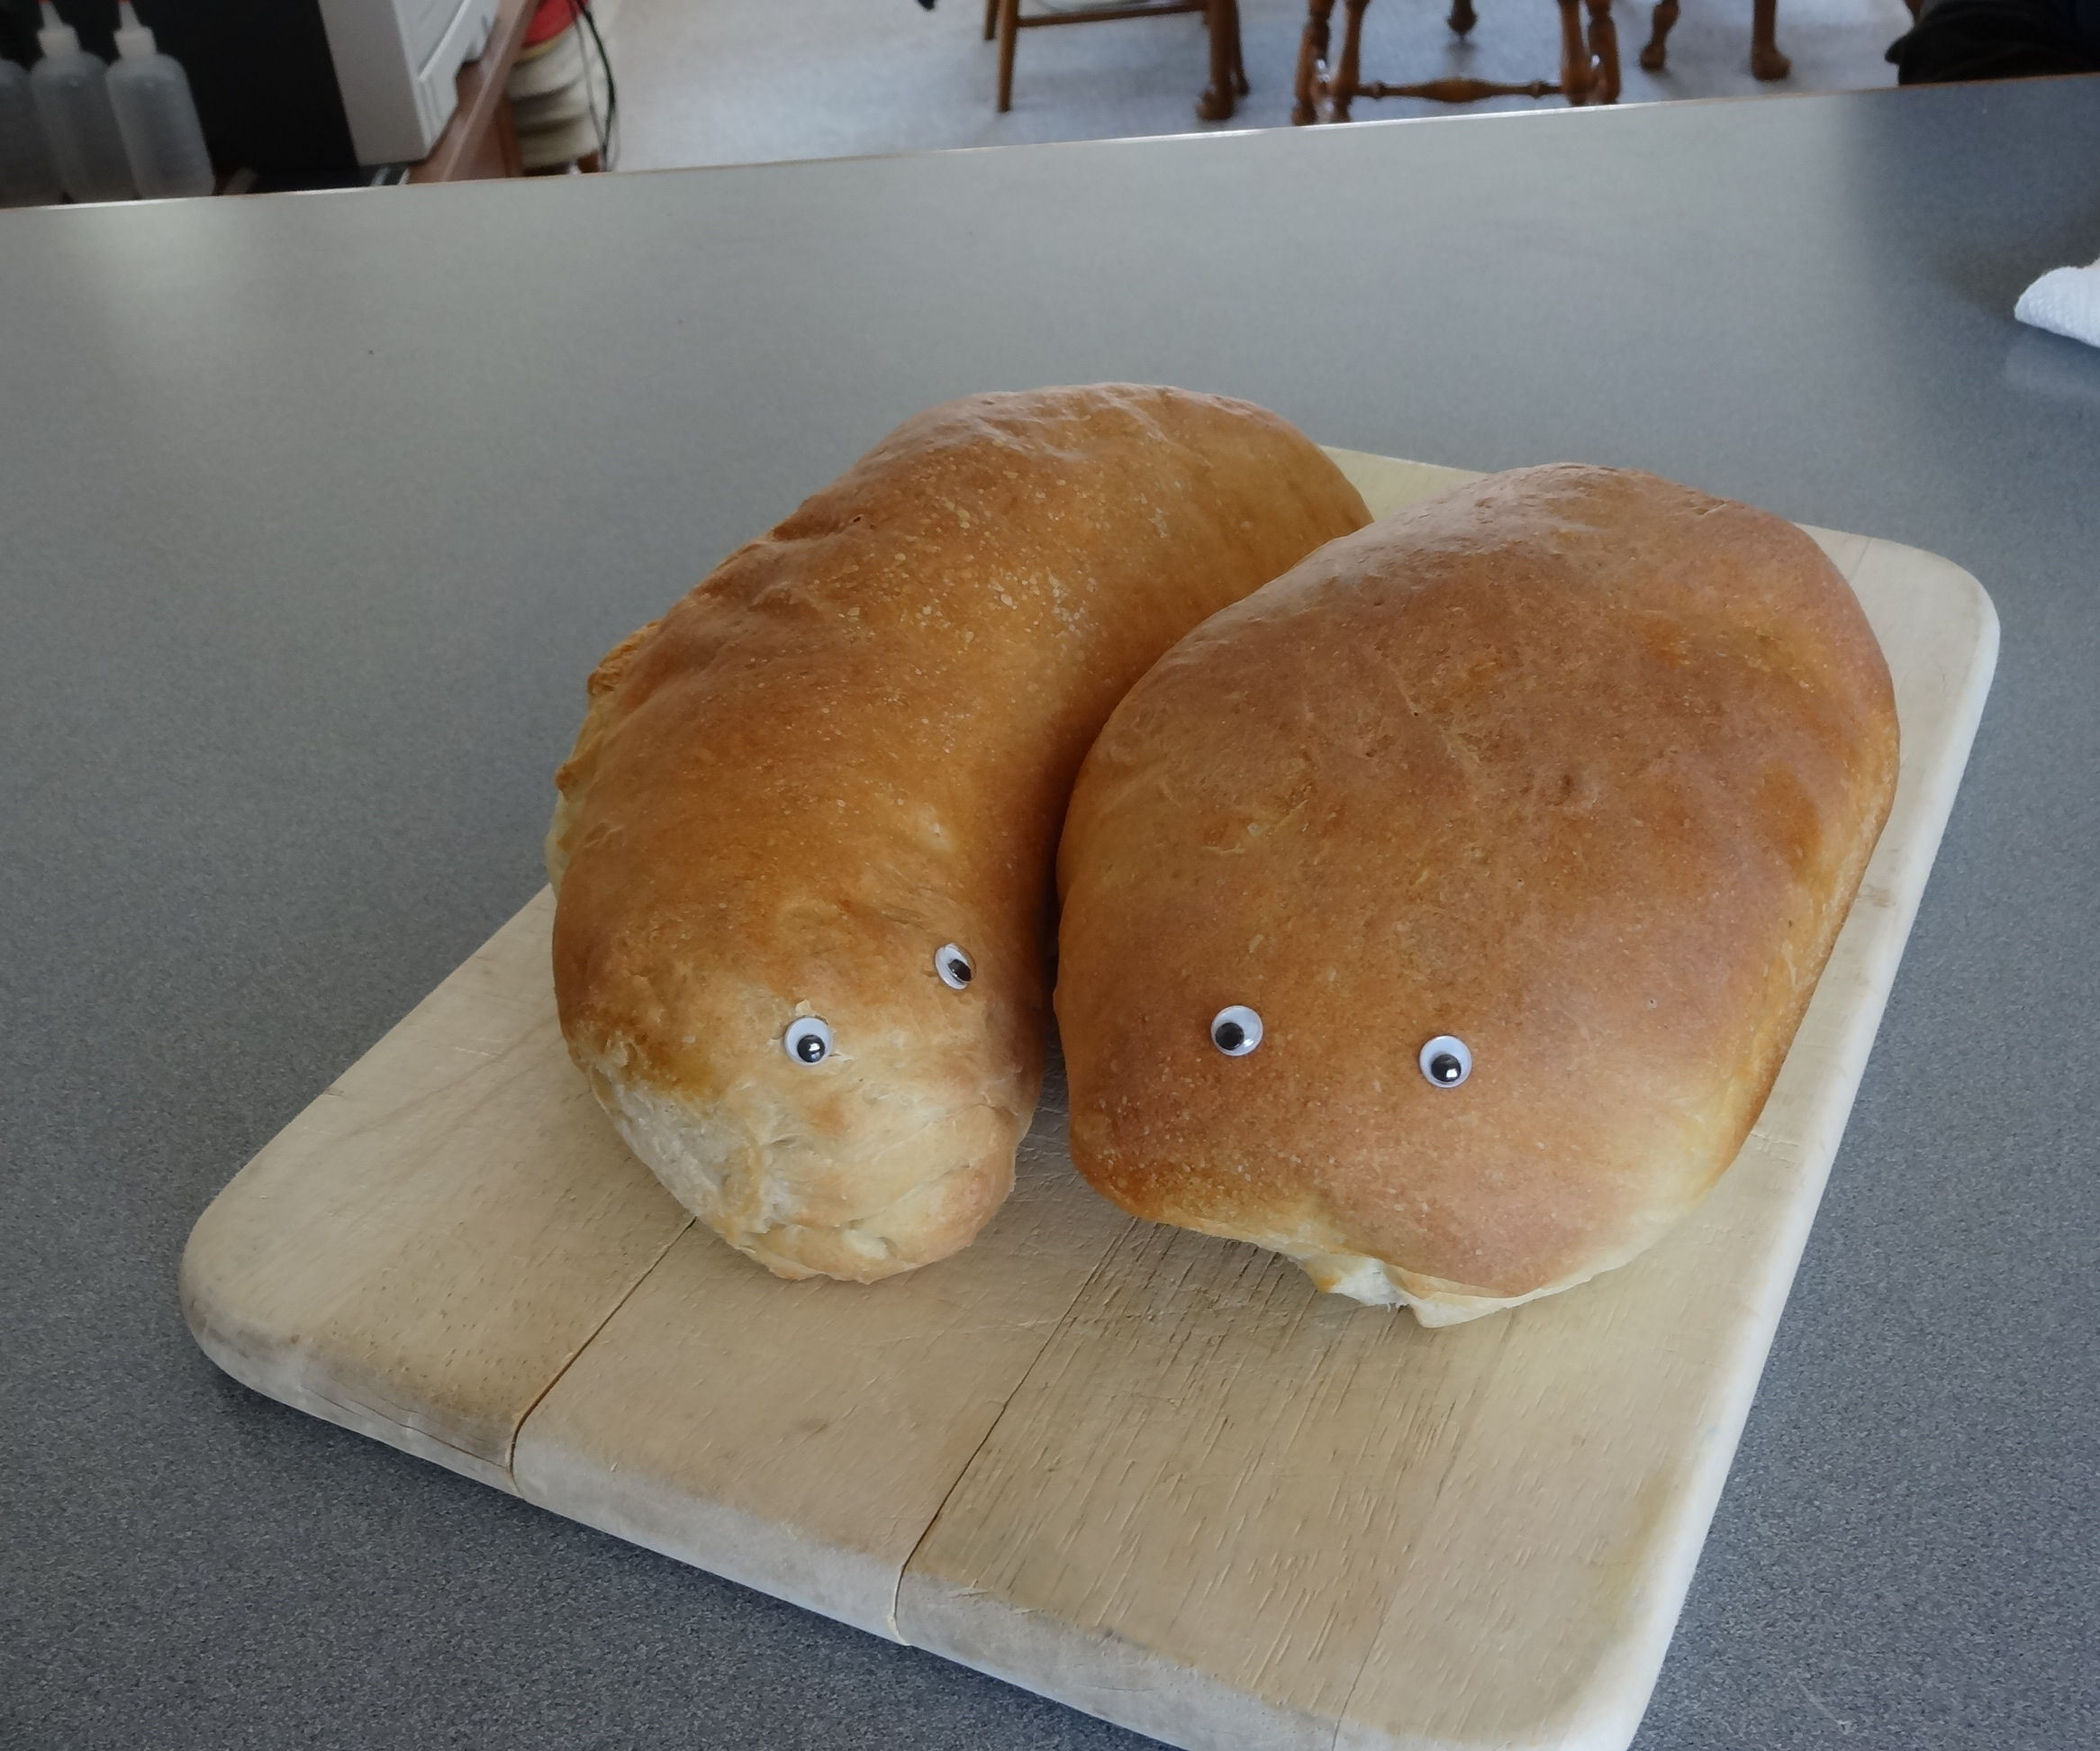 Soft Crust French / Italian Yeast Bread